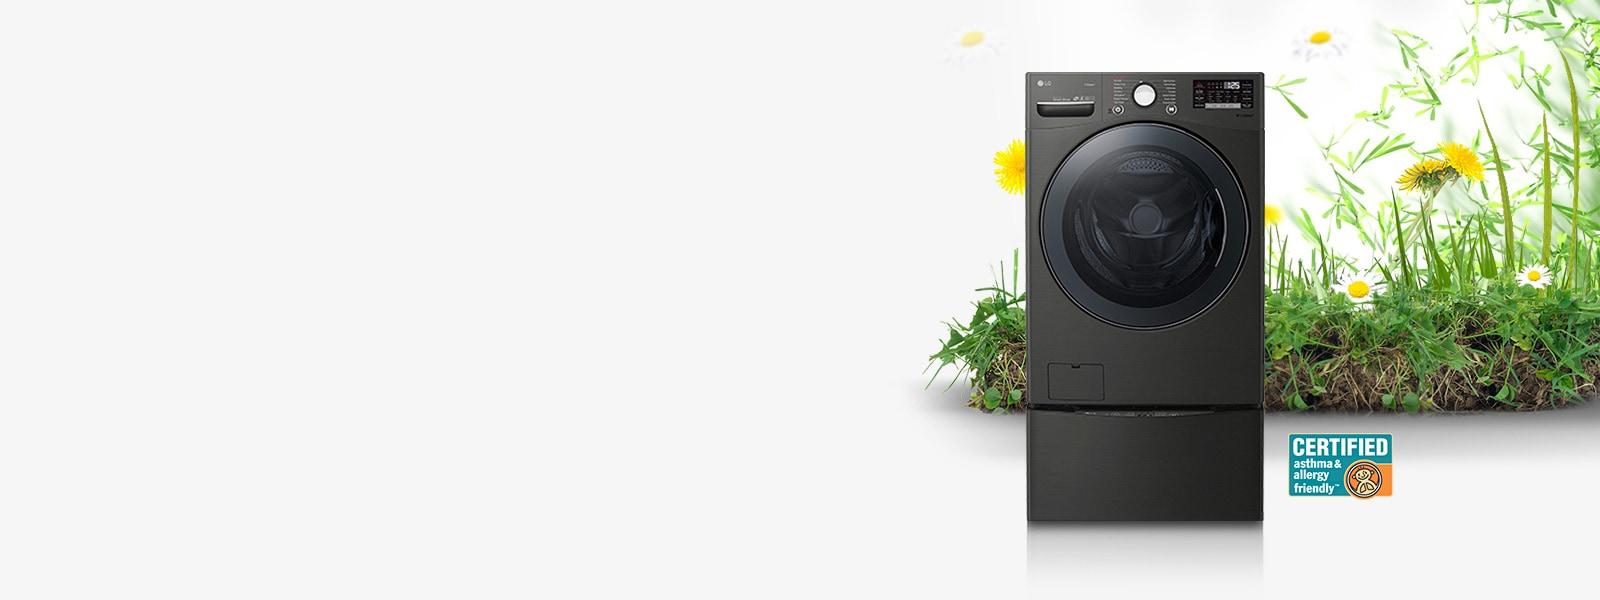 best lg washer 2020 LG Washers: Innovative Washing Machine Solutions | LG USA